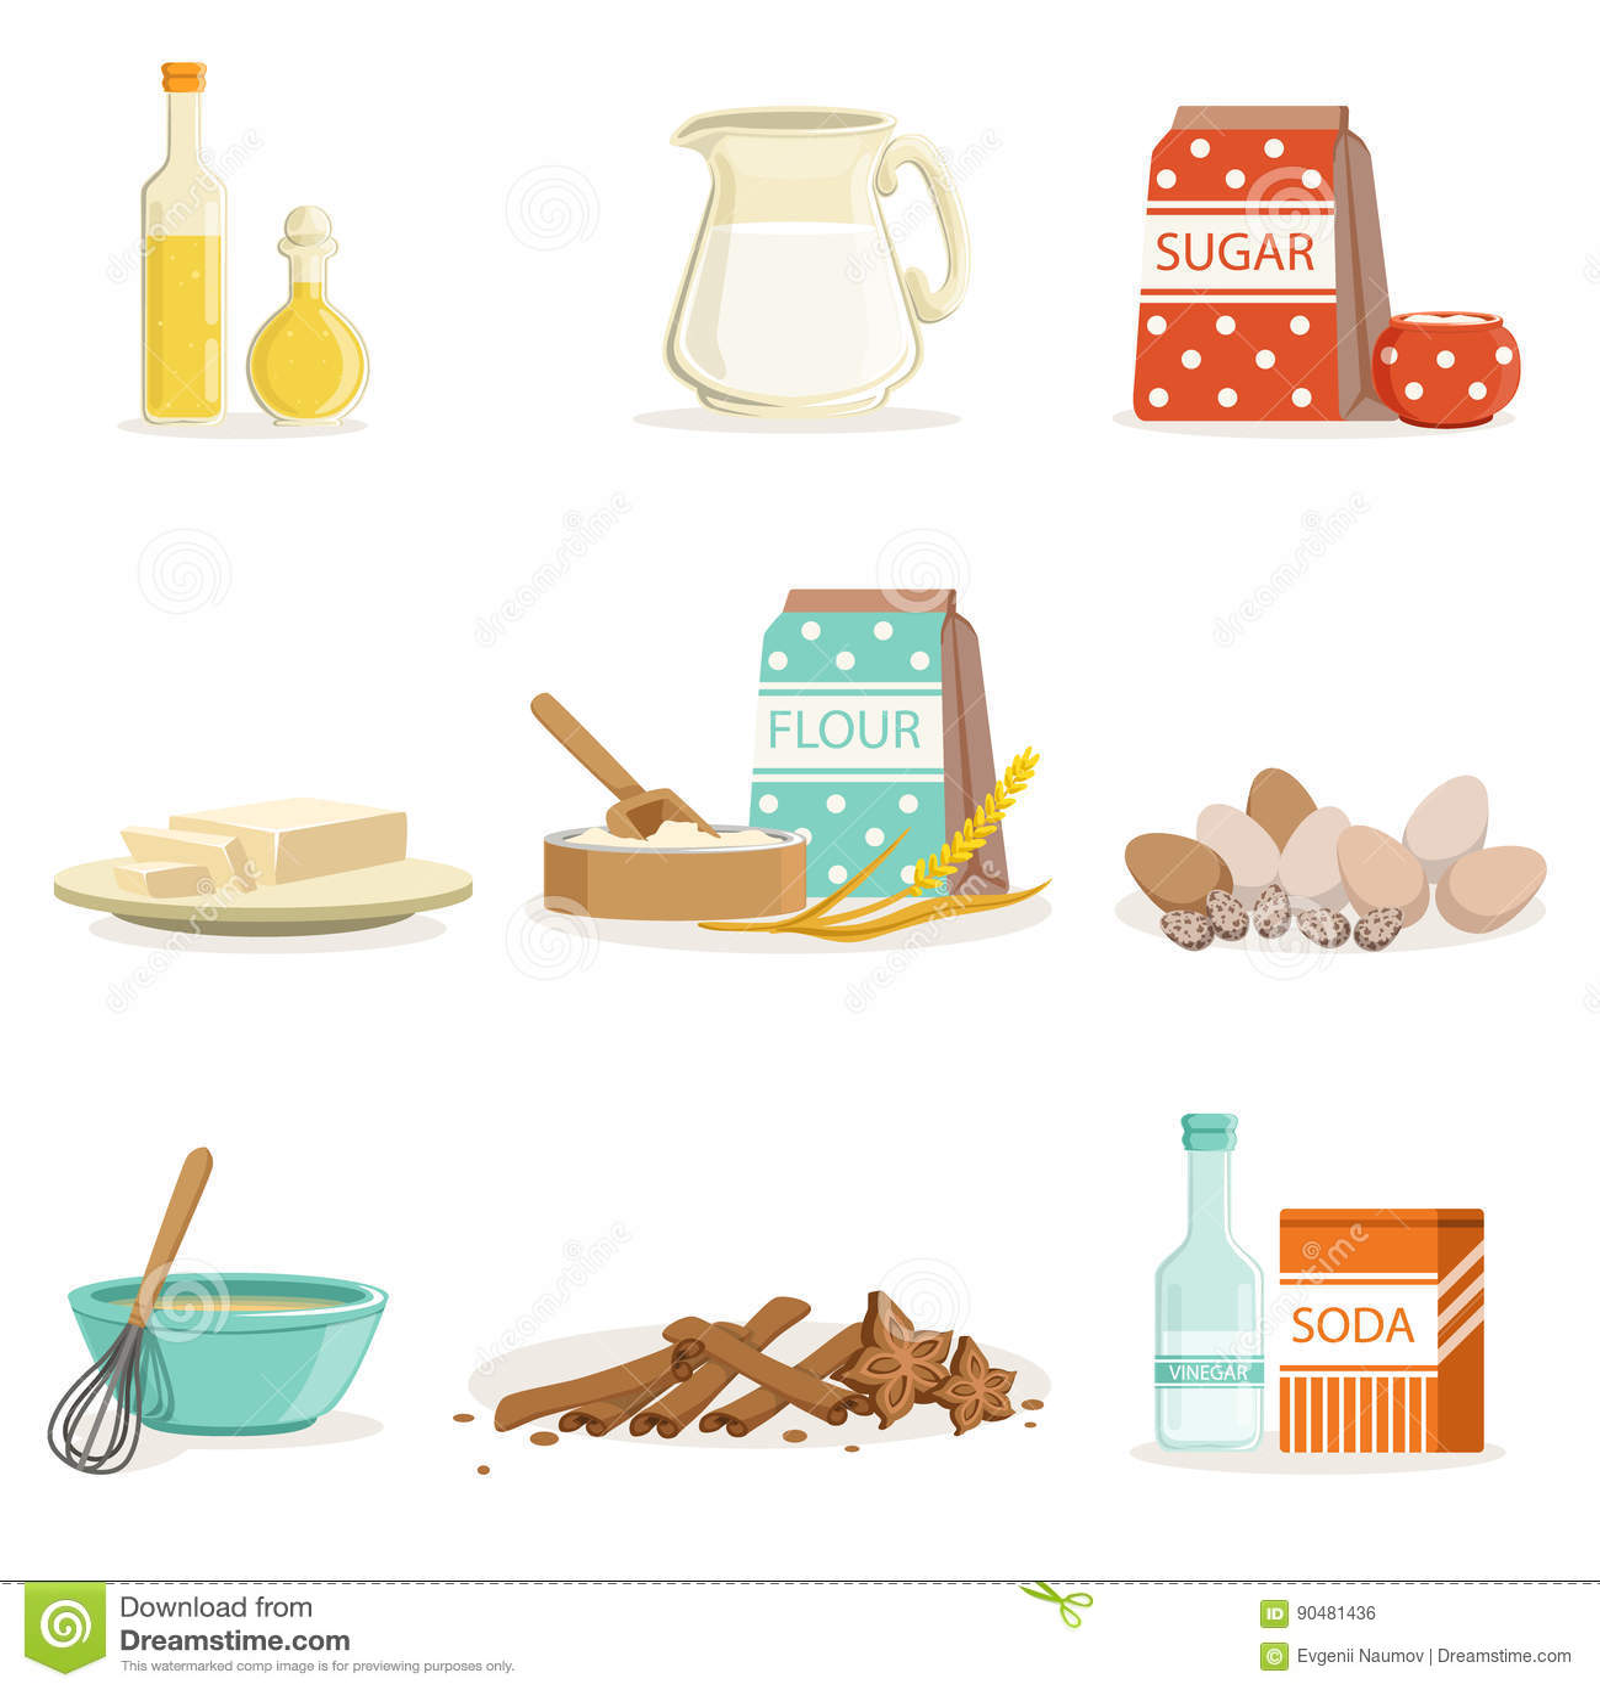 Kitchen Tools And Utensils baking ingredients and kitchen tools and utensils collection of